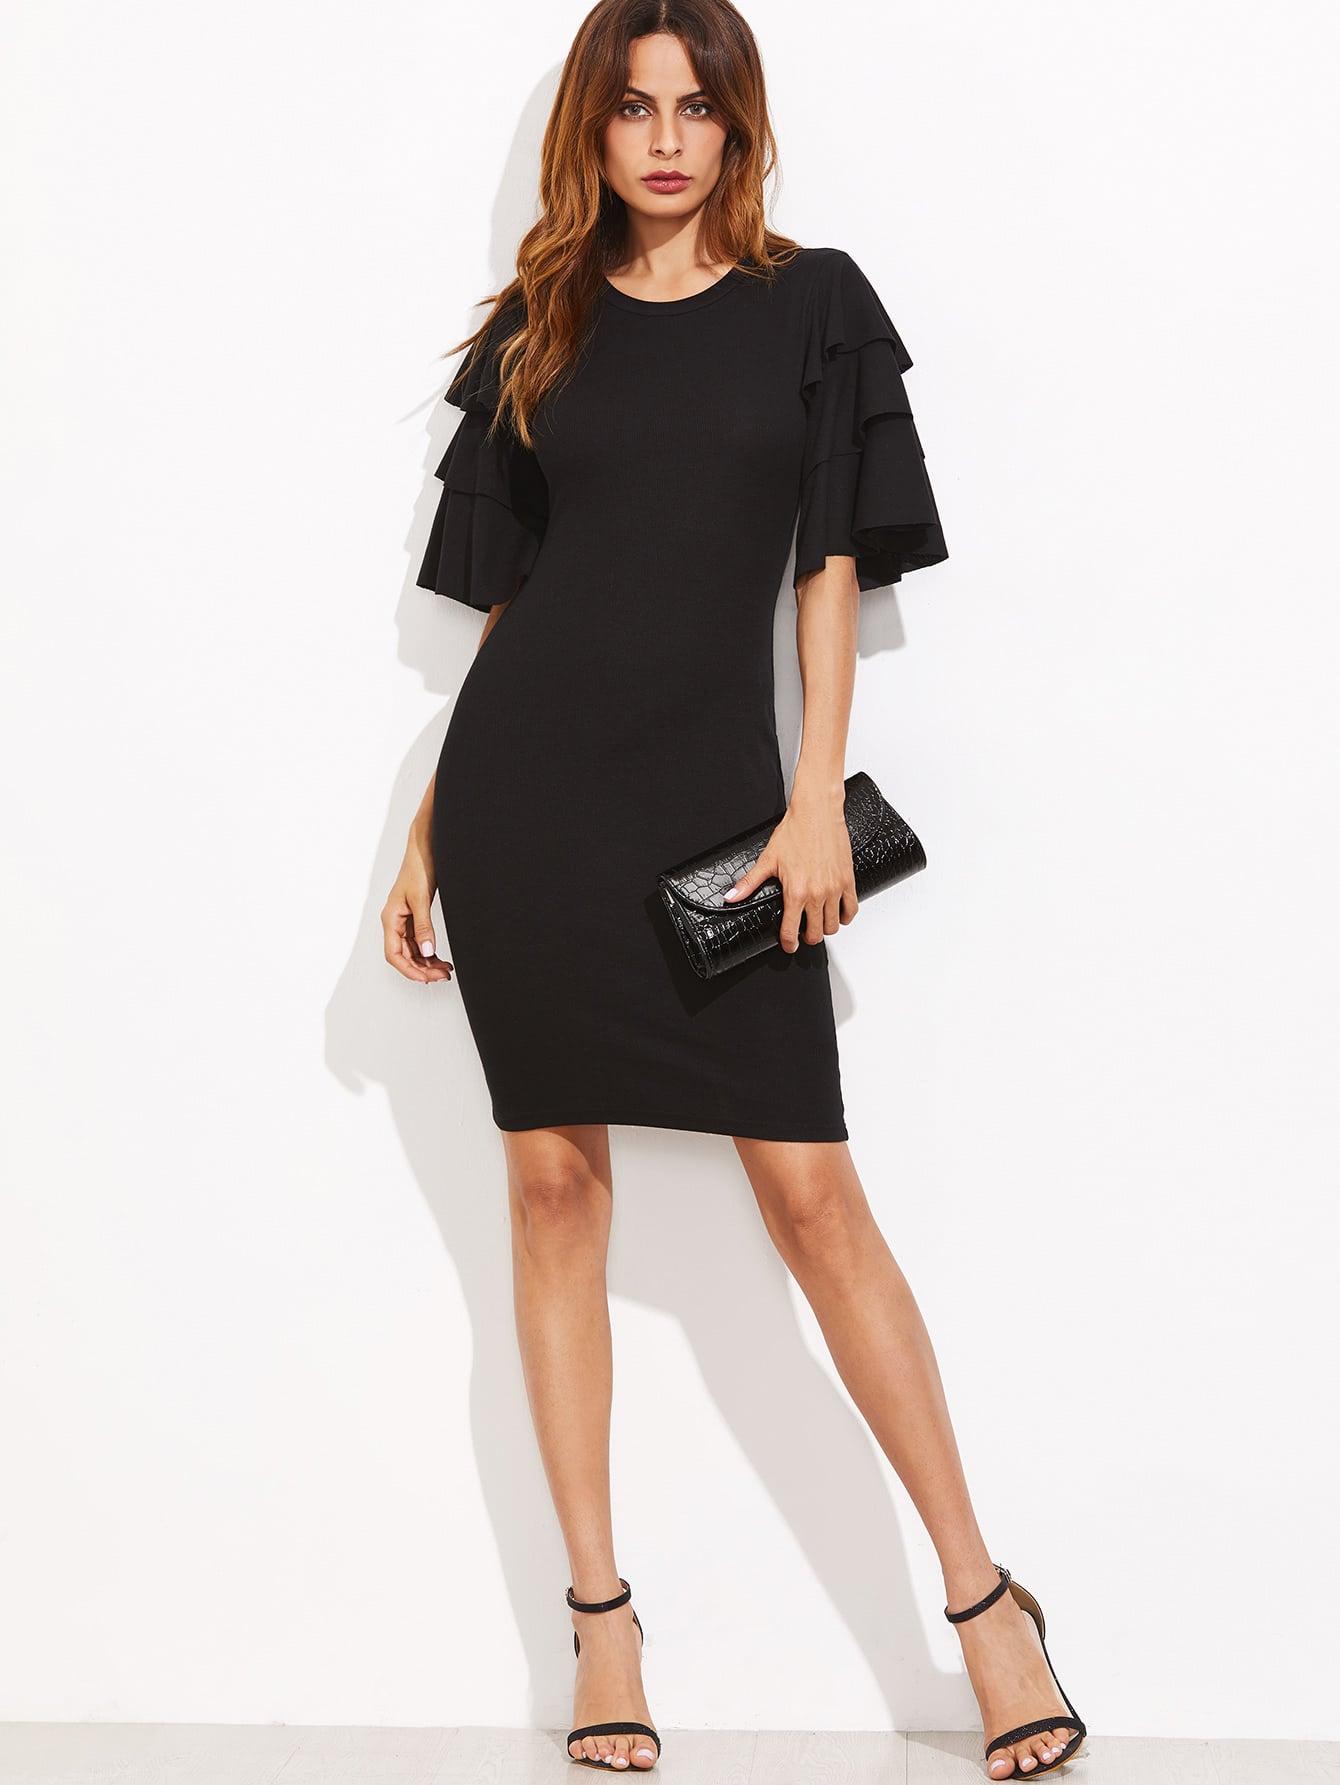 Layered Ruffle Sleeve Ribbed Dress burgundy contrast sheer neck layered sleeve ruffle dress